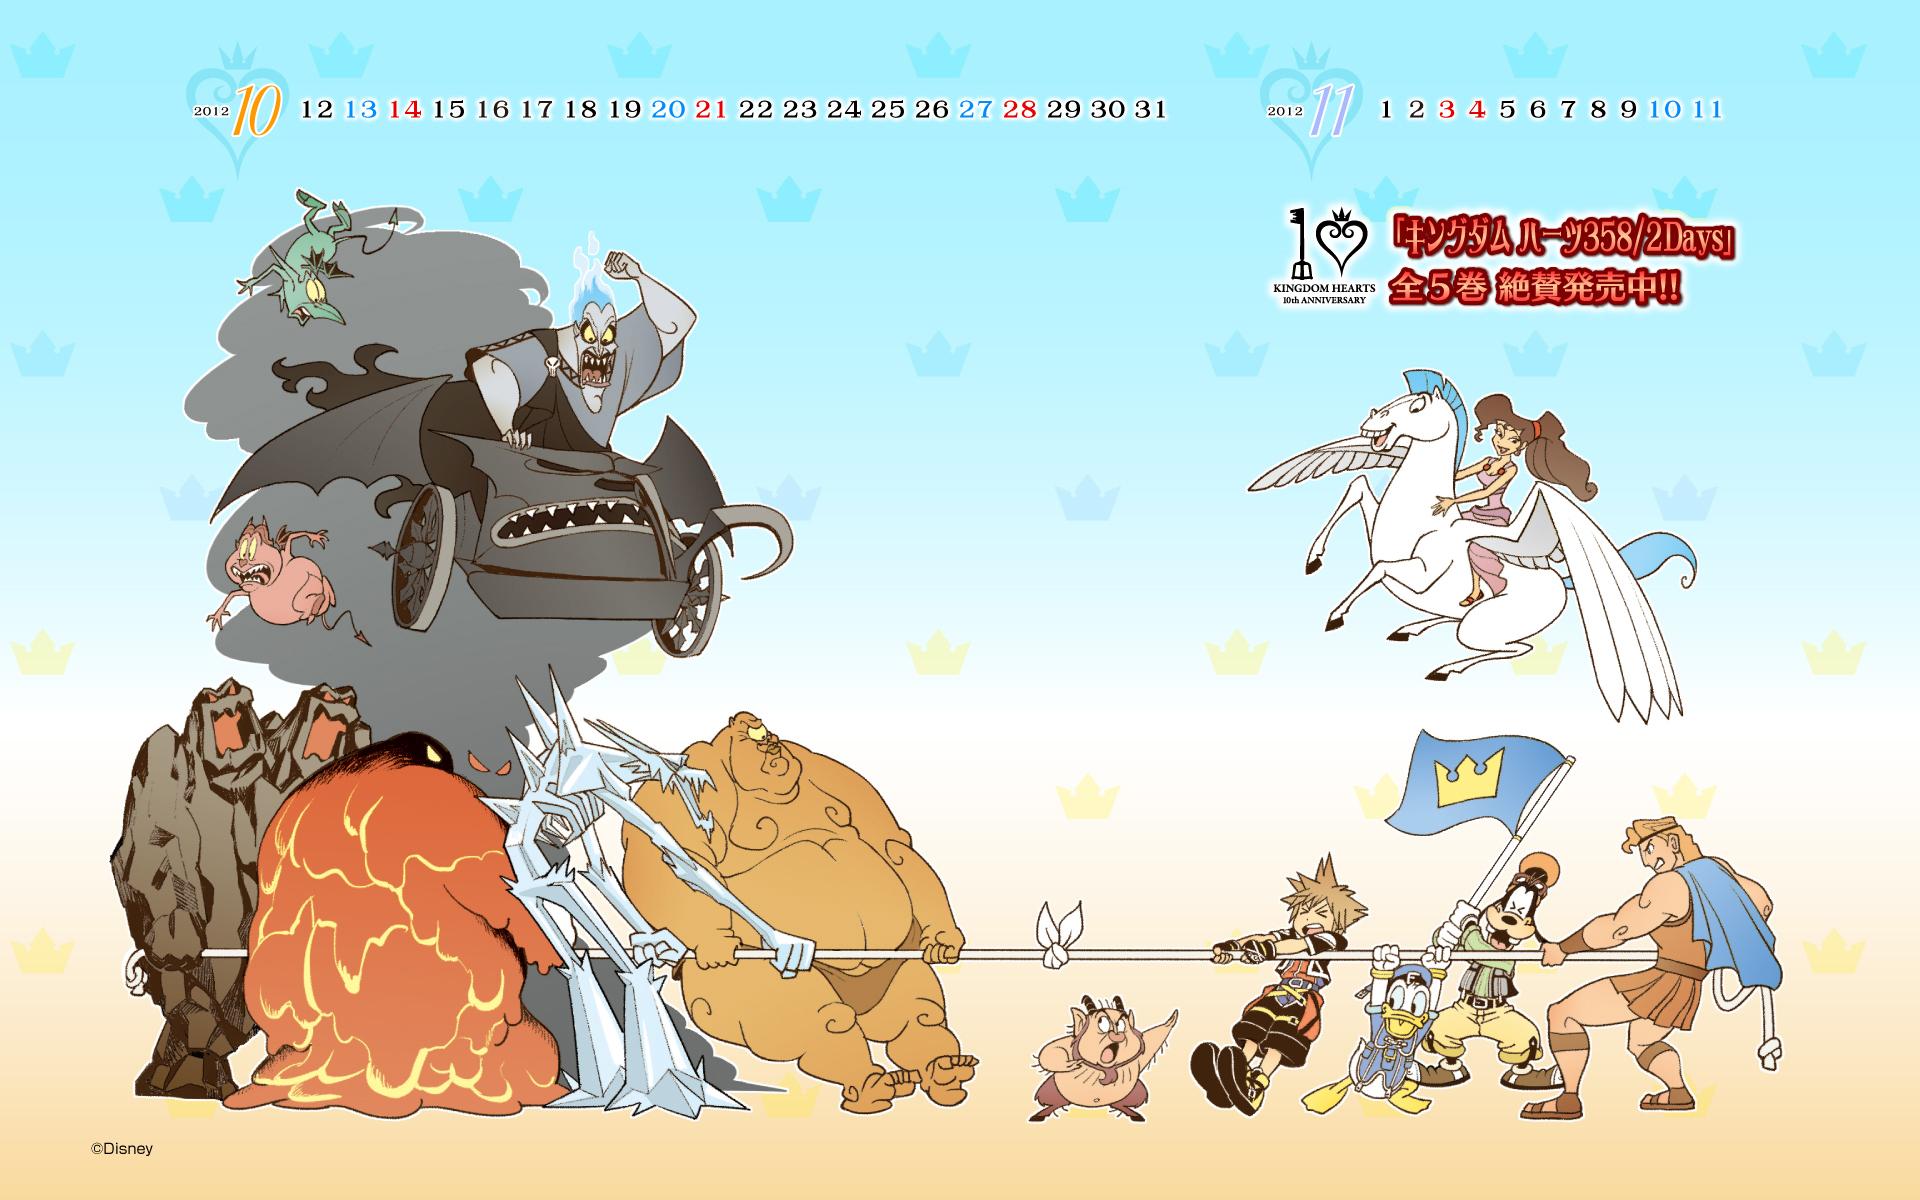 Kh 10th Anniversary Wallpaper 3 News Kingdom Hearts Insider